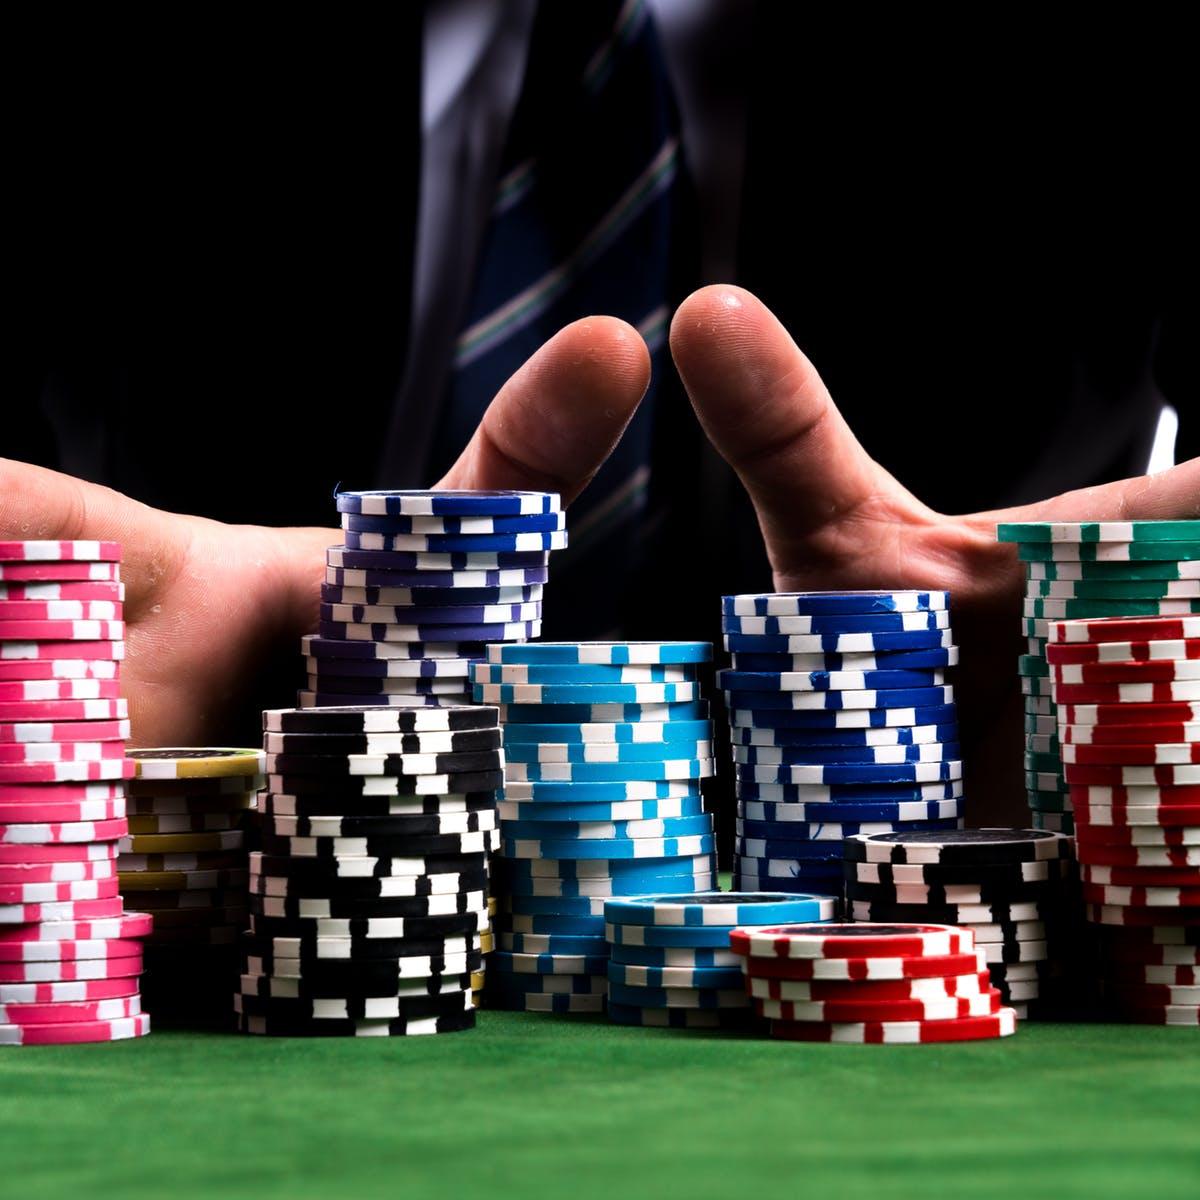 Skills that poker enhances